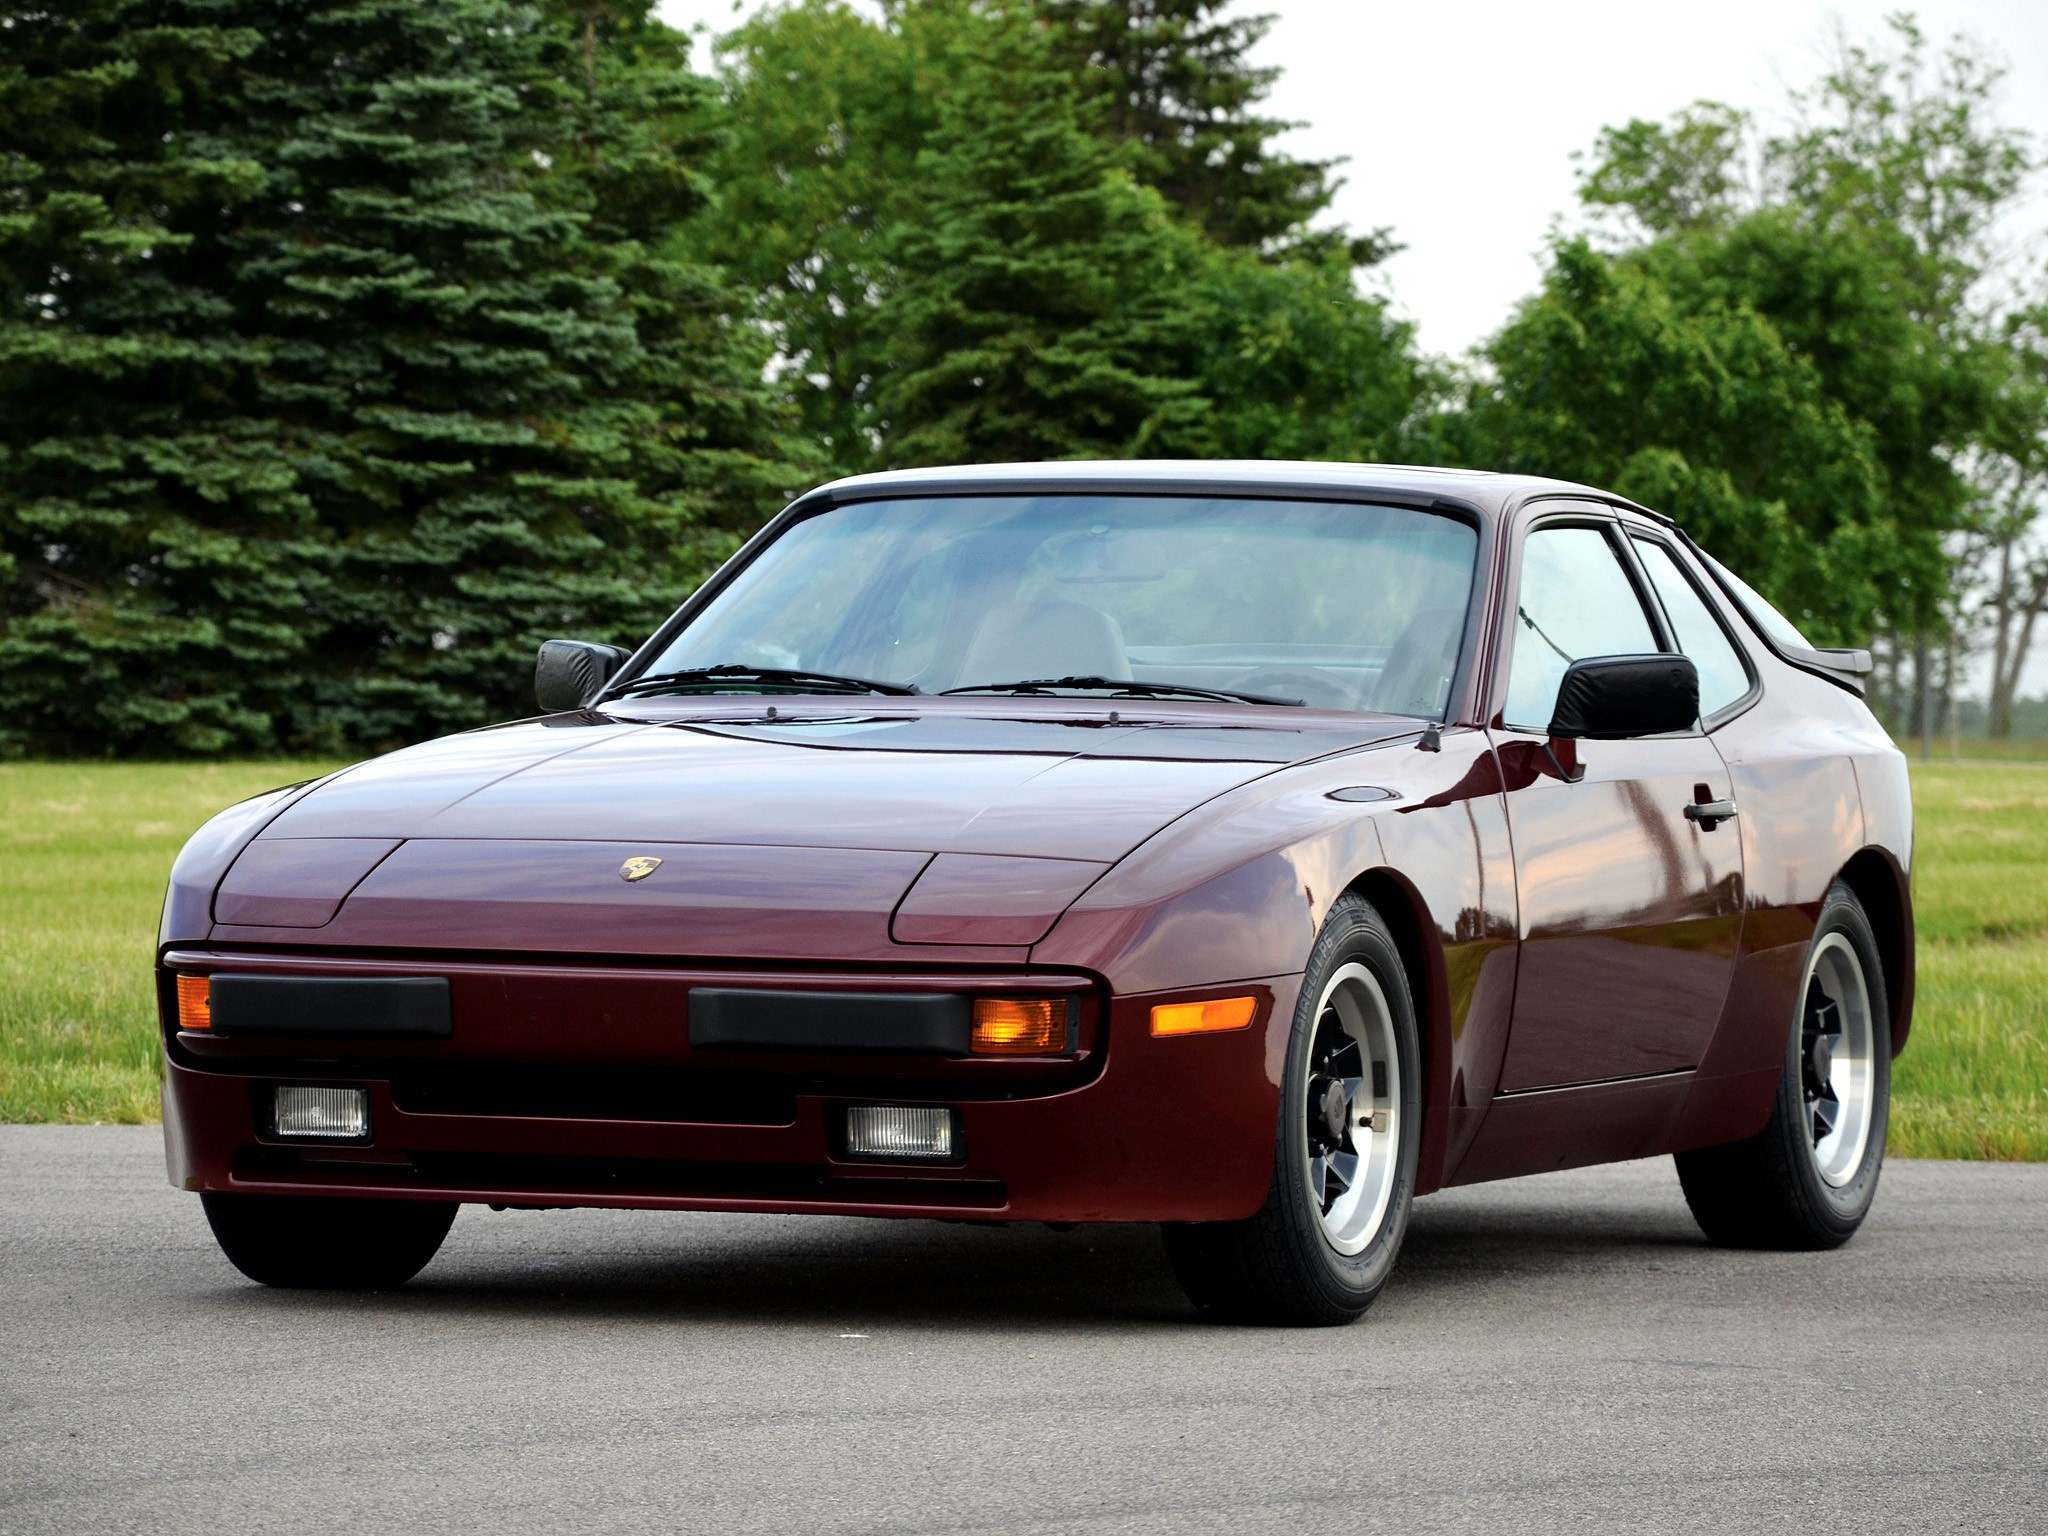 Porsche 944 Specs 1981 1982 1983 1984 1985 1986